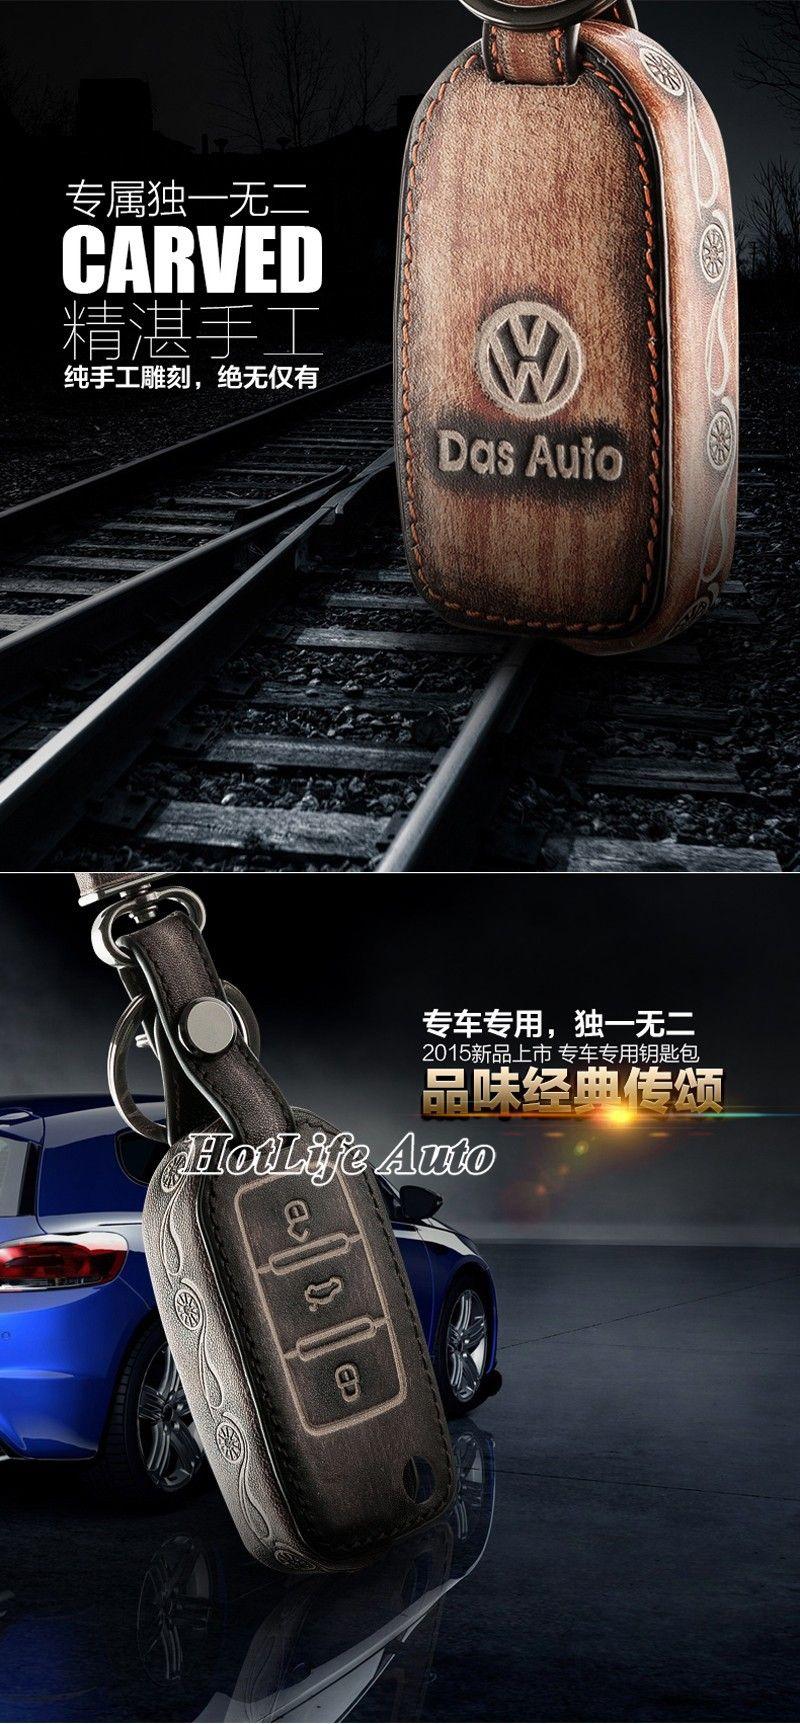 2014 2015Mazda 3 CX-5 CX 5 Axela Car Keychain Genuine Leather Carve Car Key Case Cover Smart Car Key Chain Ring Auto Accessory